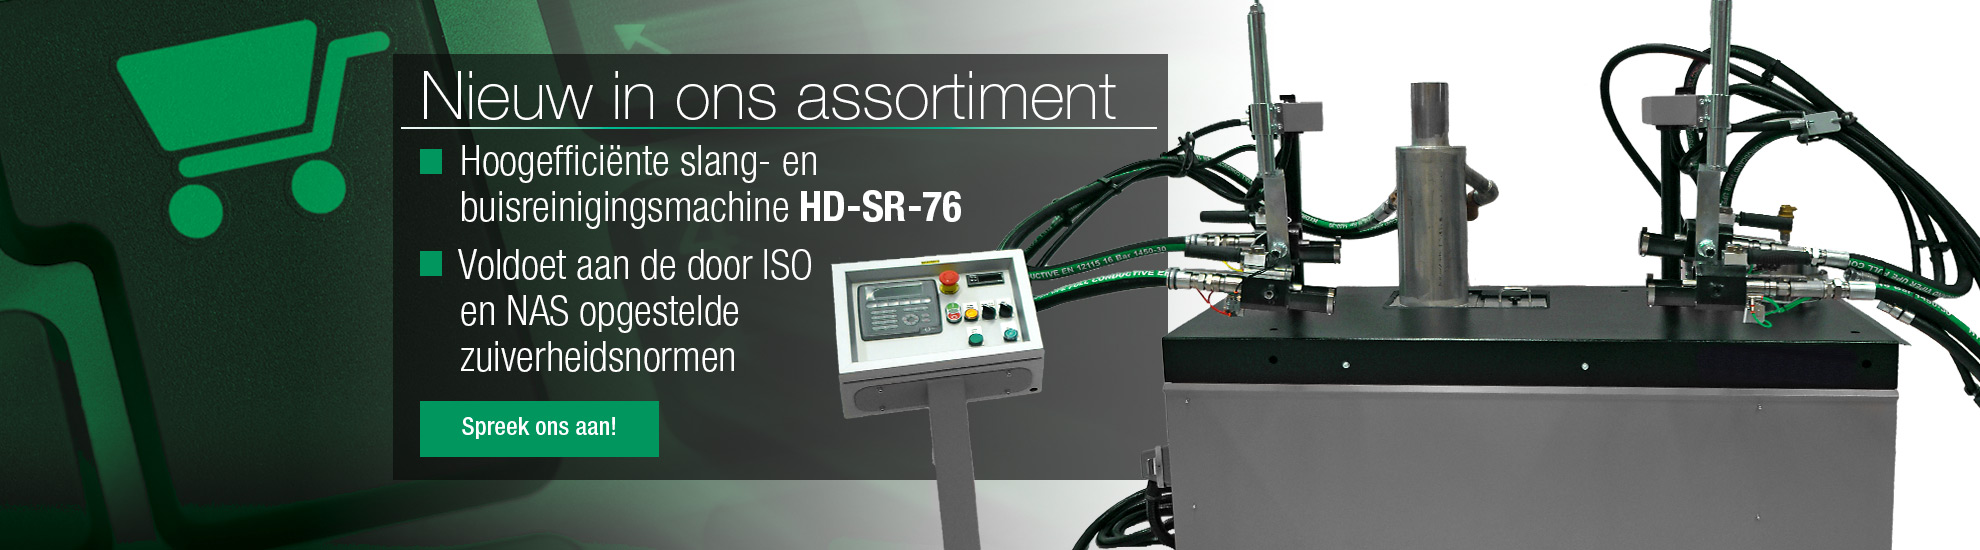 slang- en buisreinigingsmachine HD-SR-76